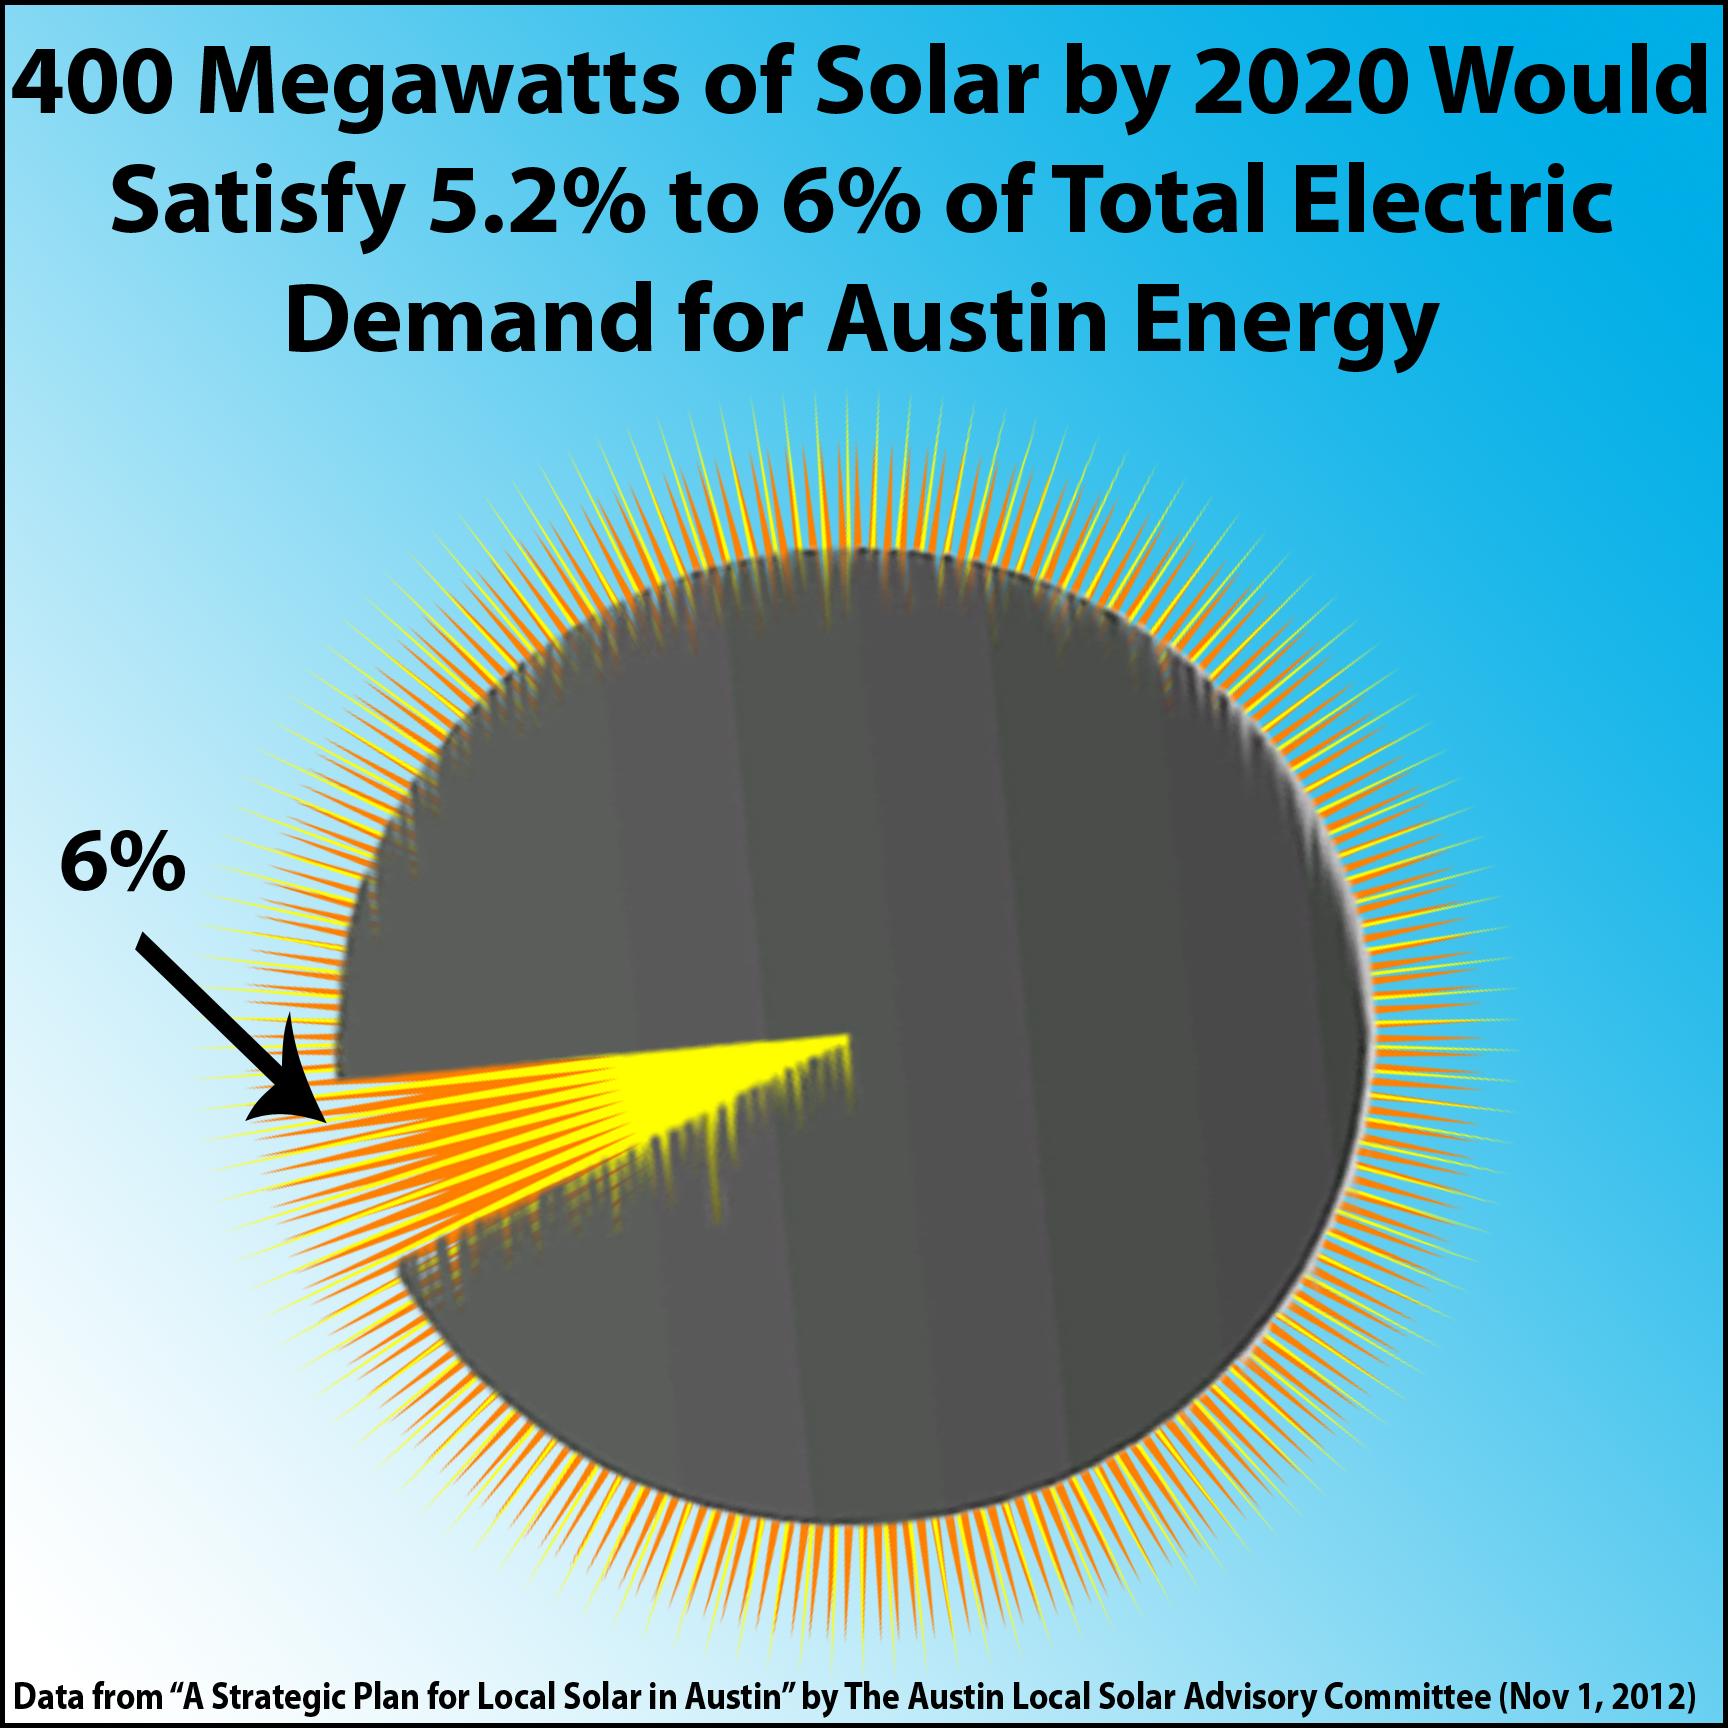 2013-08-06 400MW Solar is 5.2-6 Percent of Austin Energy Demand by 2020 (sun pie graph)